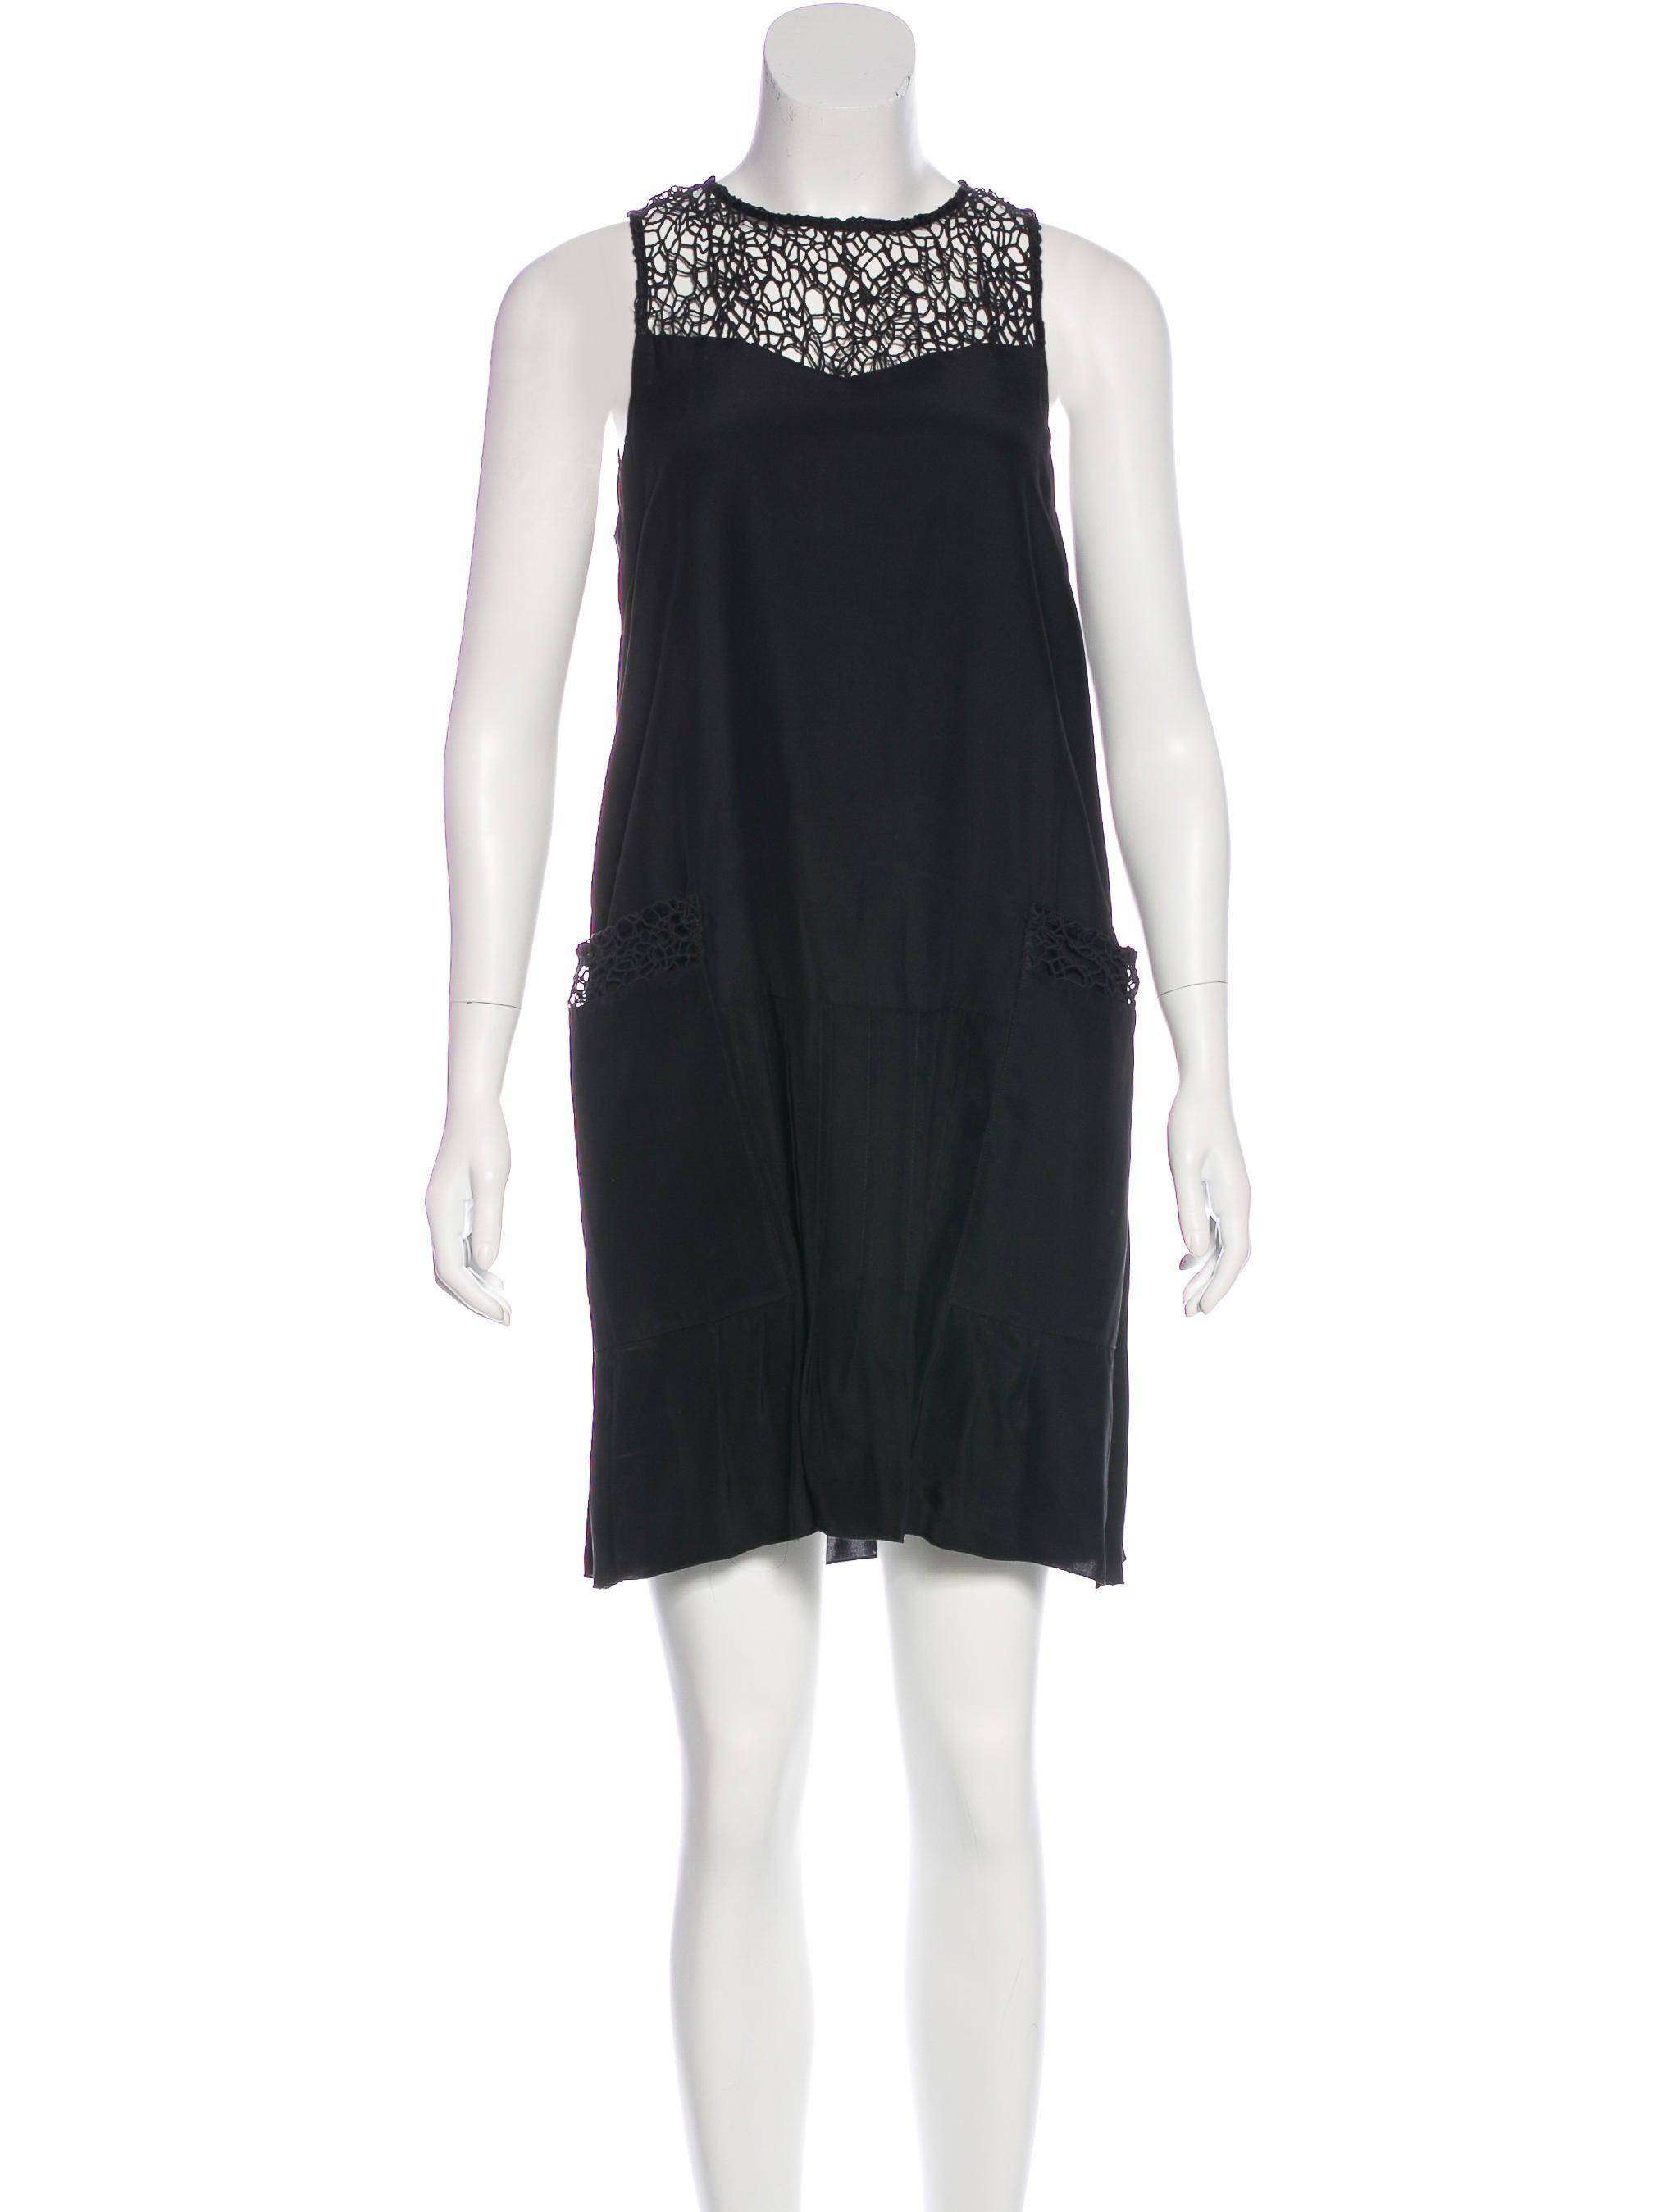 Rag Amp Bone Lace Trimmed Silk Dress Clothing Wragb78360